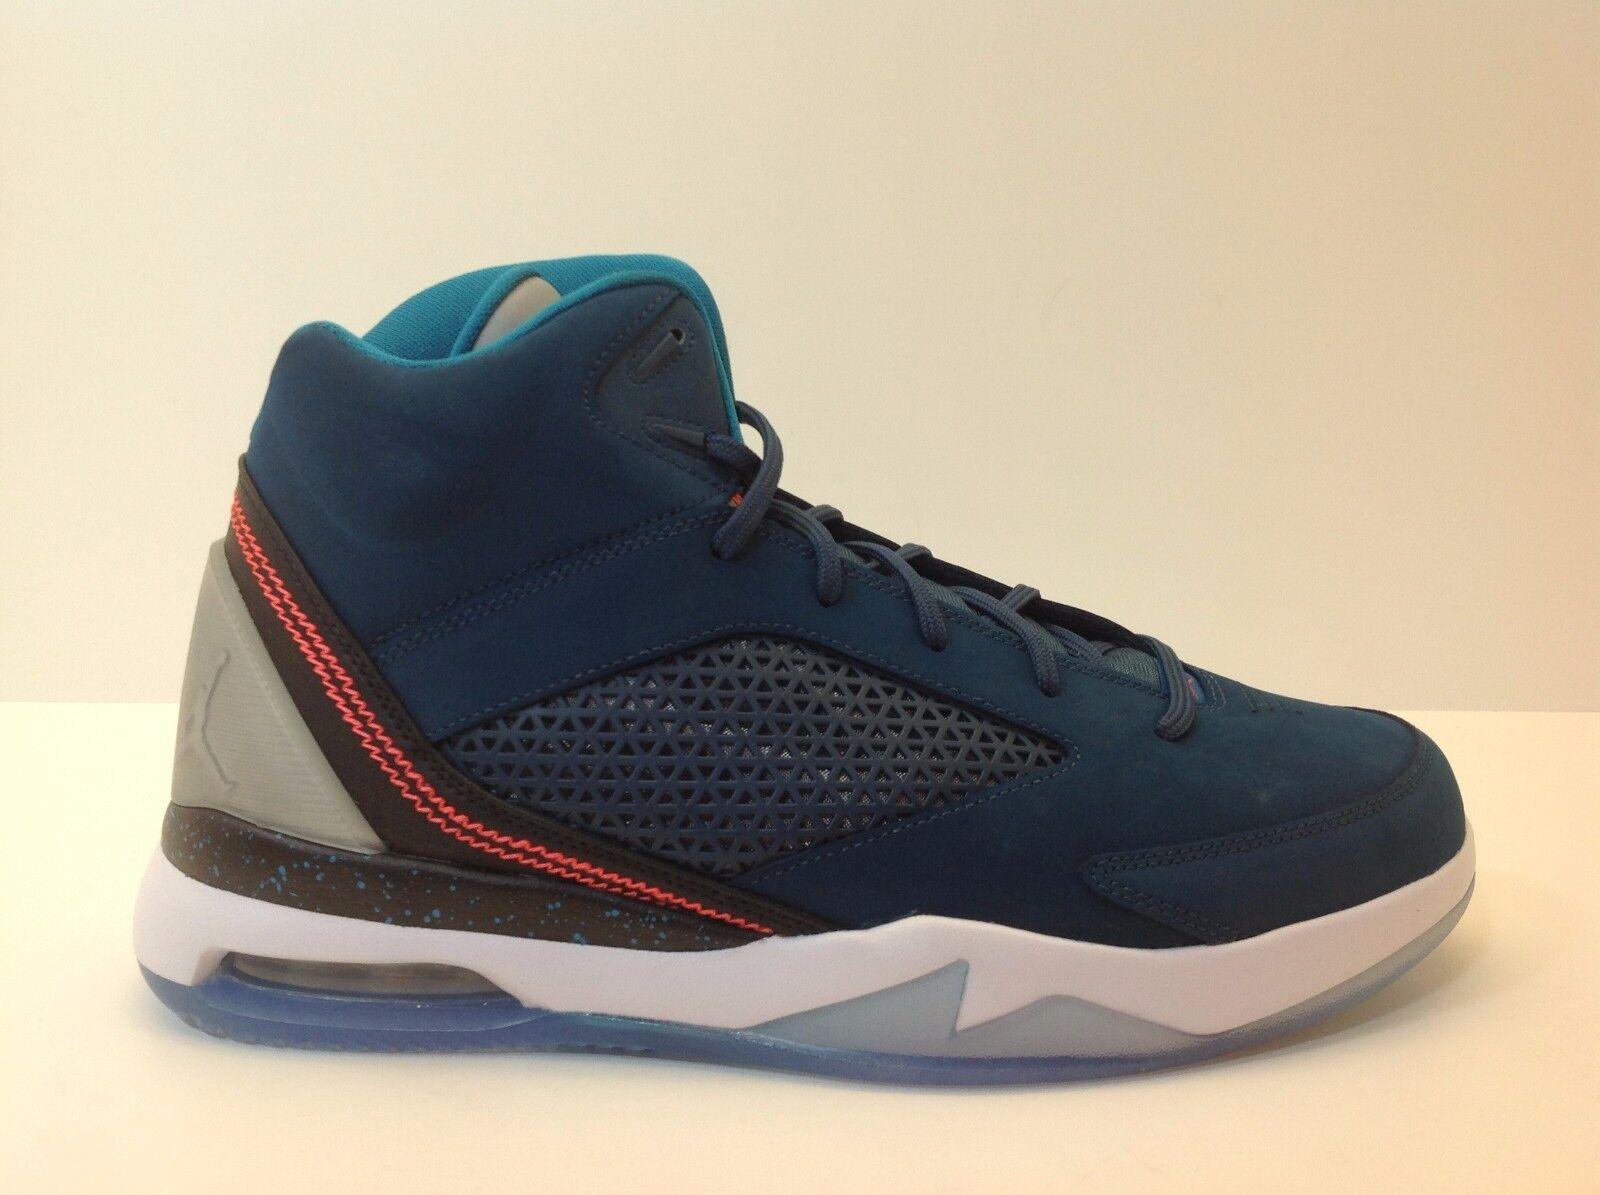 Nike Air Jordan Flight Remix Blue/Infrared Men's Comfortable Cheap women's shoes women's shoes